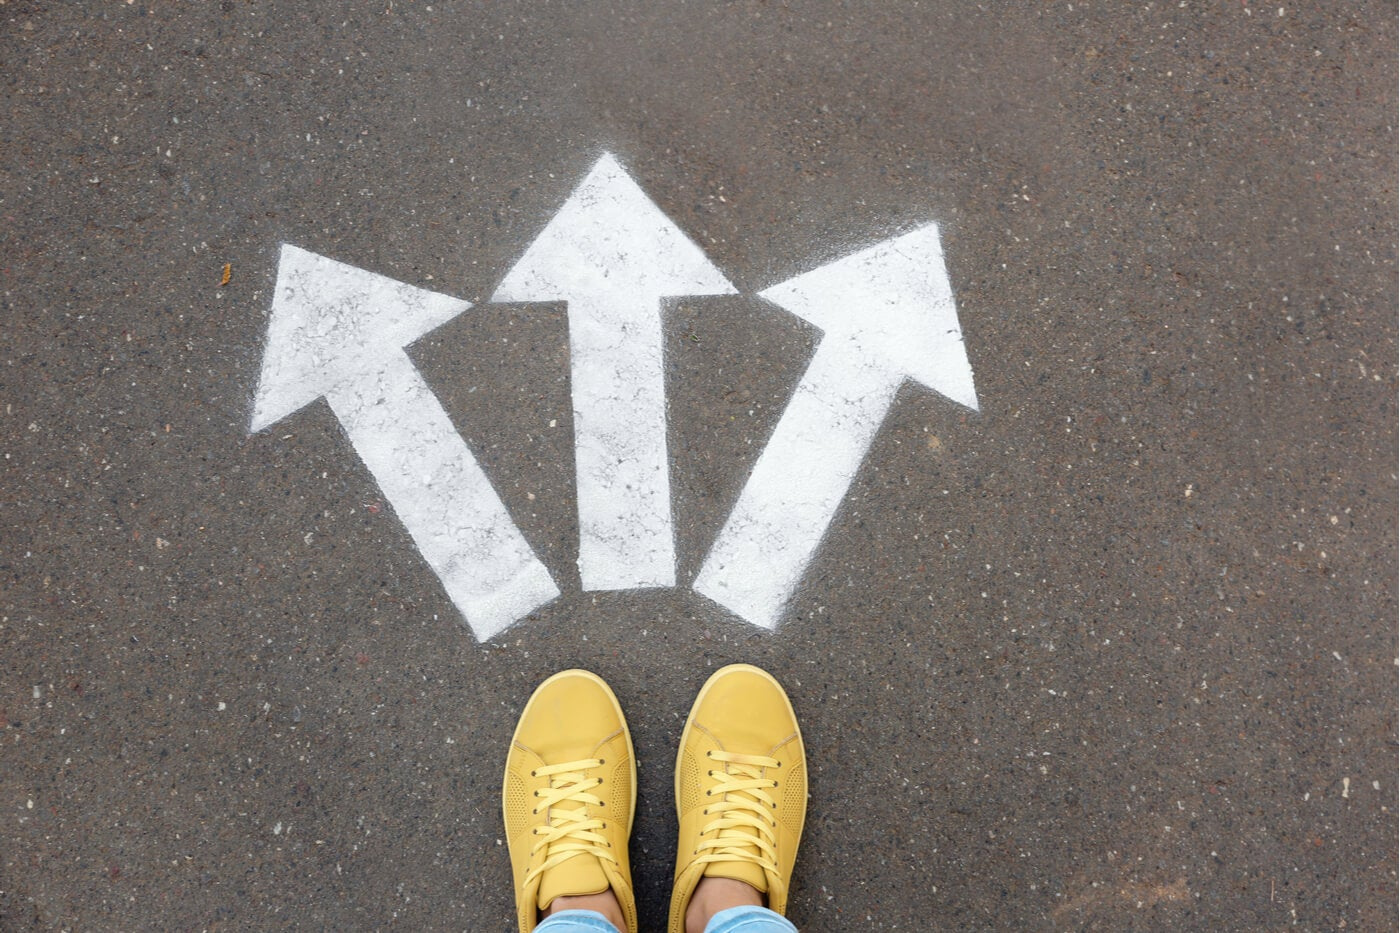 flechas dirección camino